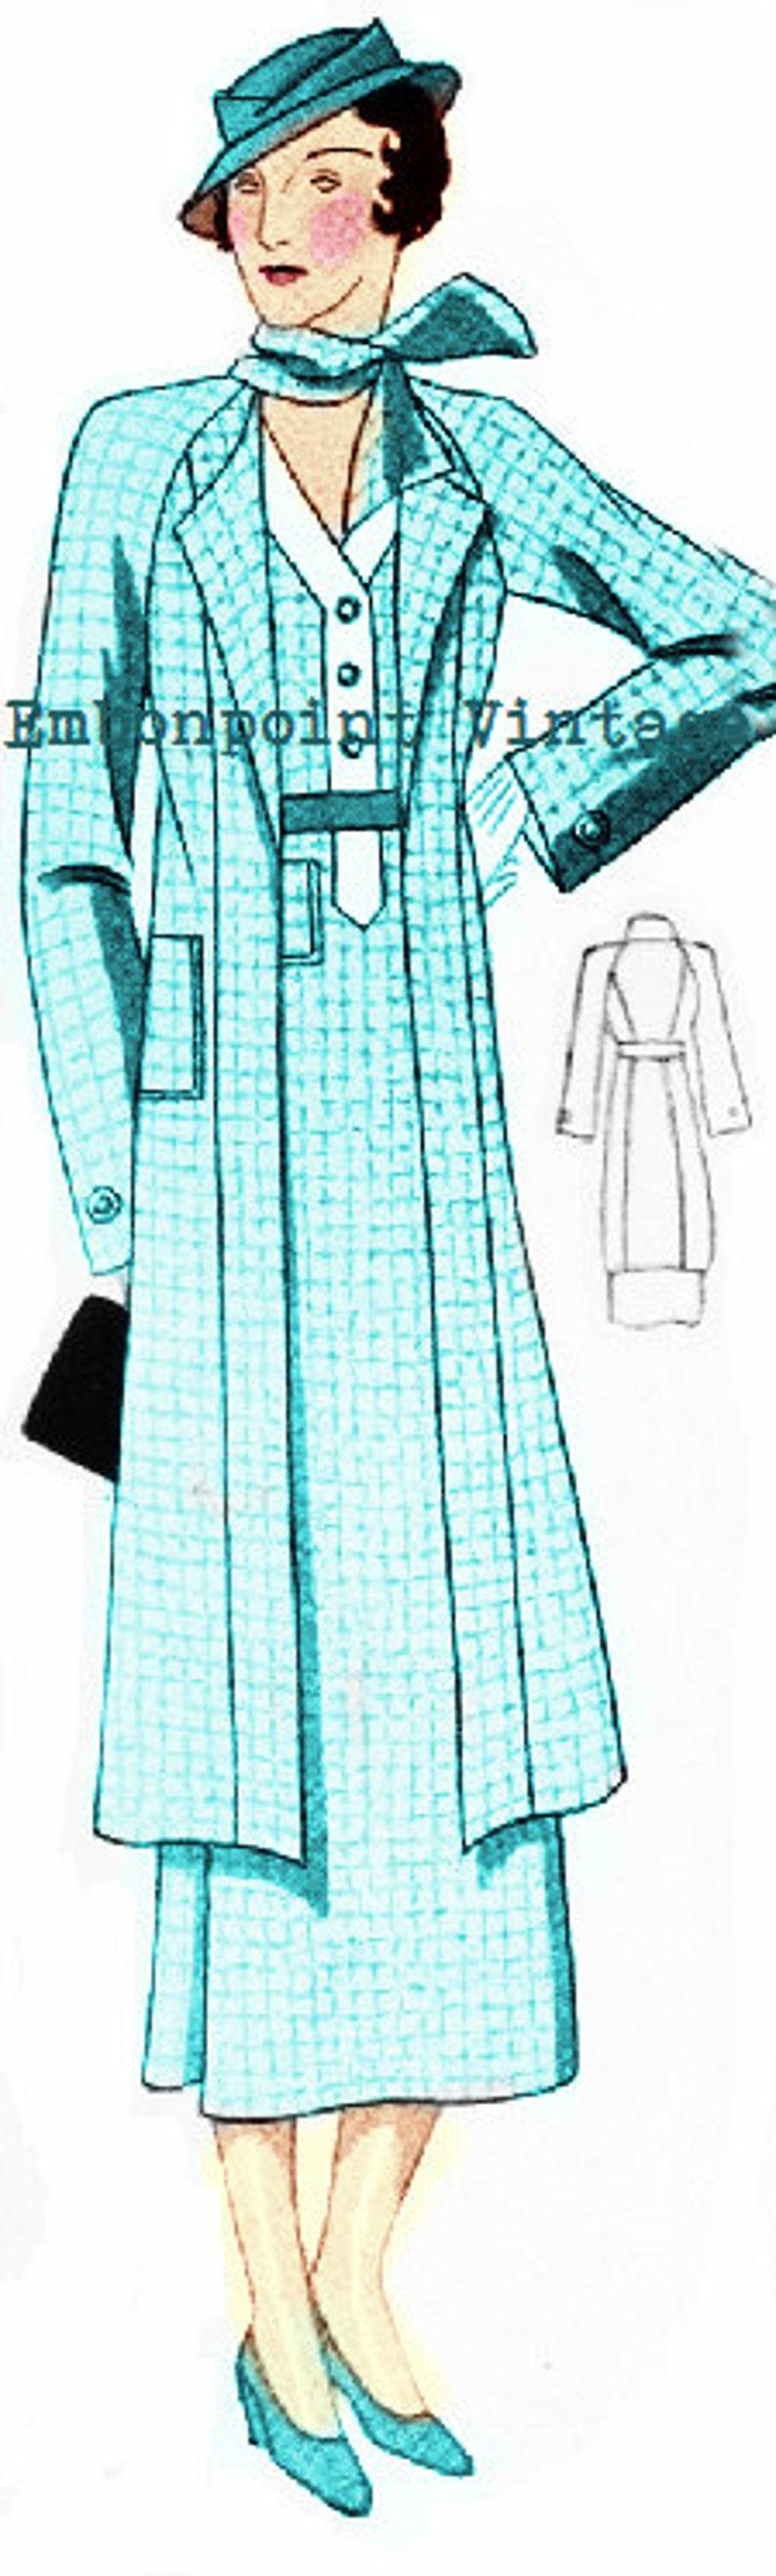 1930s Sewing Patterns- Dresses, Pants, Tops Plus Size (or any size) 1934 Vintage Suit Ensemble Sewing Pattern - PDF - Pattern No 73 Effie 1930s 30s Patterns Instant Download $13.97 AT vintagedancer.com